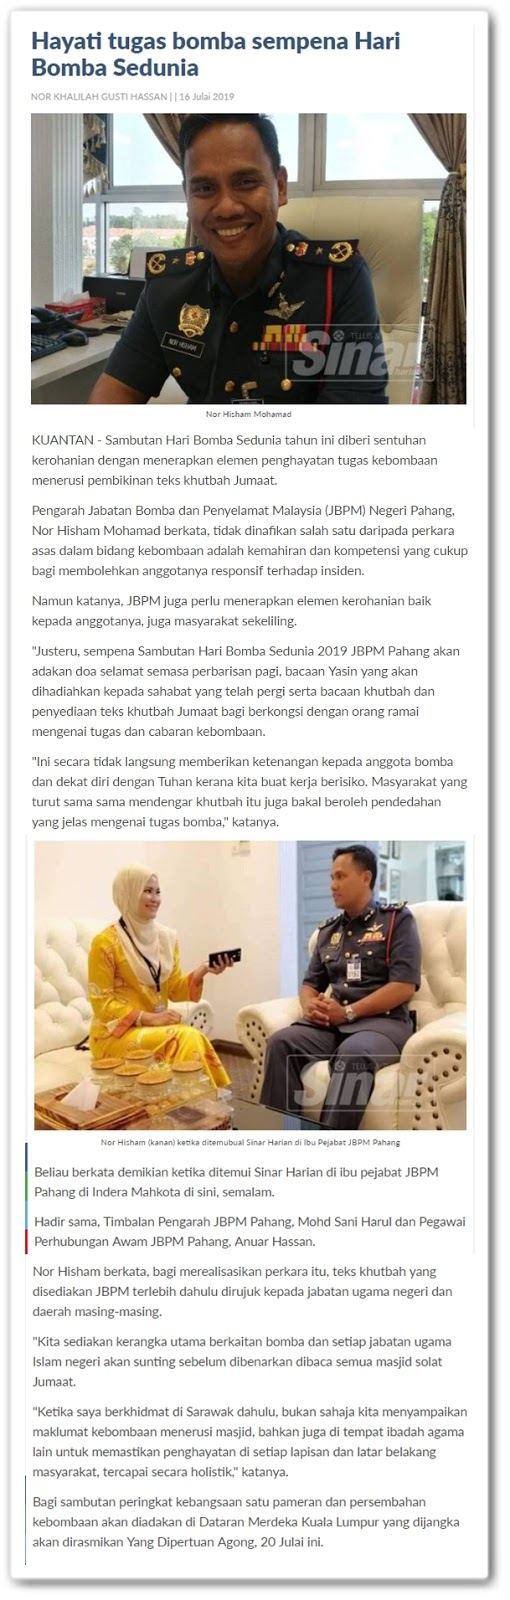 Hayati tugas bomba sempena Hari Bomba Sedunia - Keratan artikel online Sinar Harian 16 Julai 2019